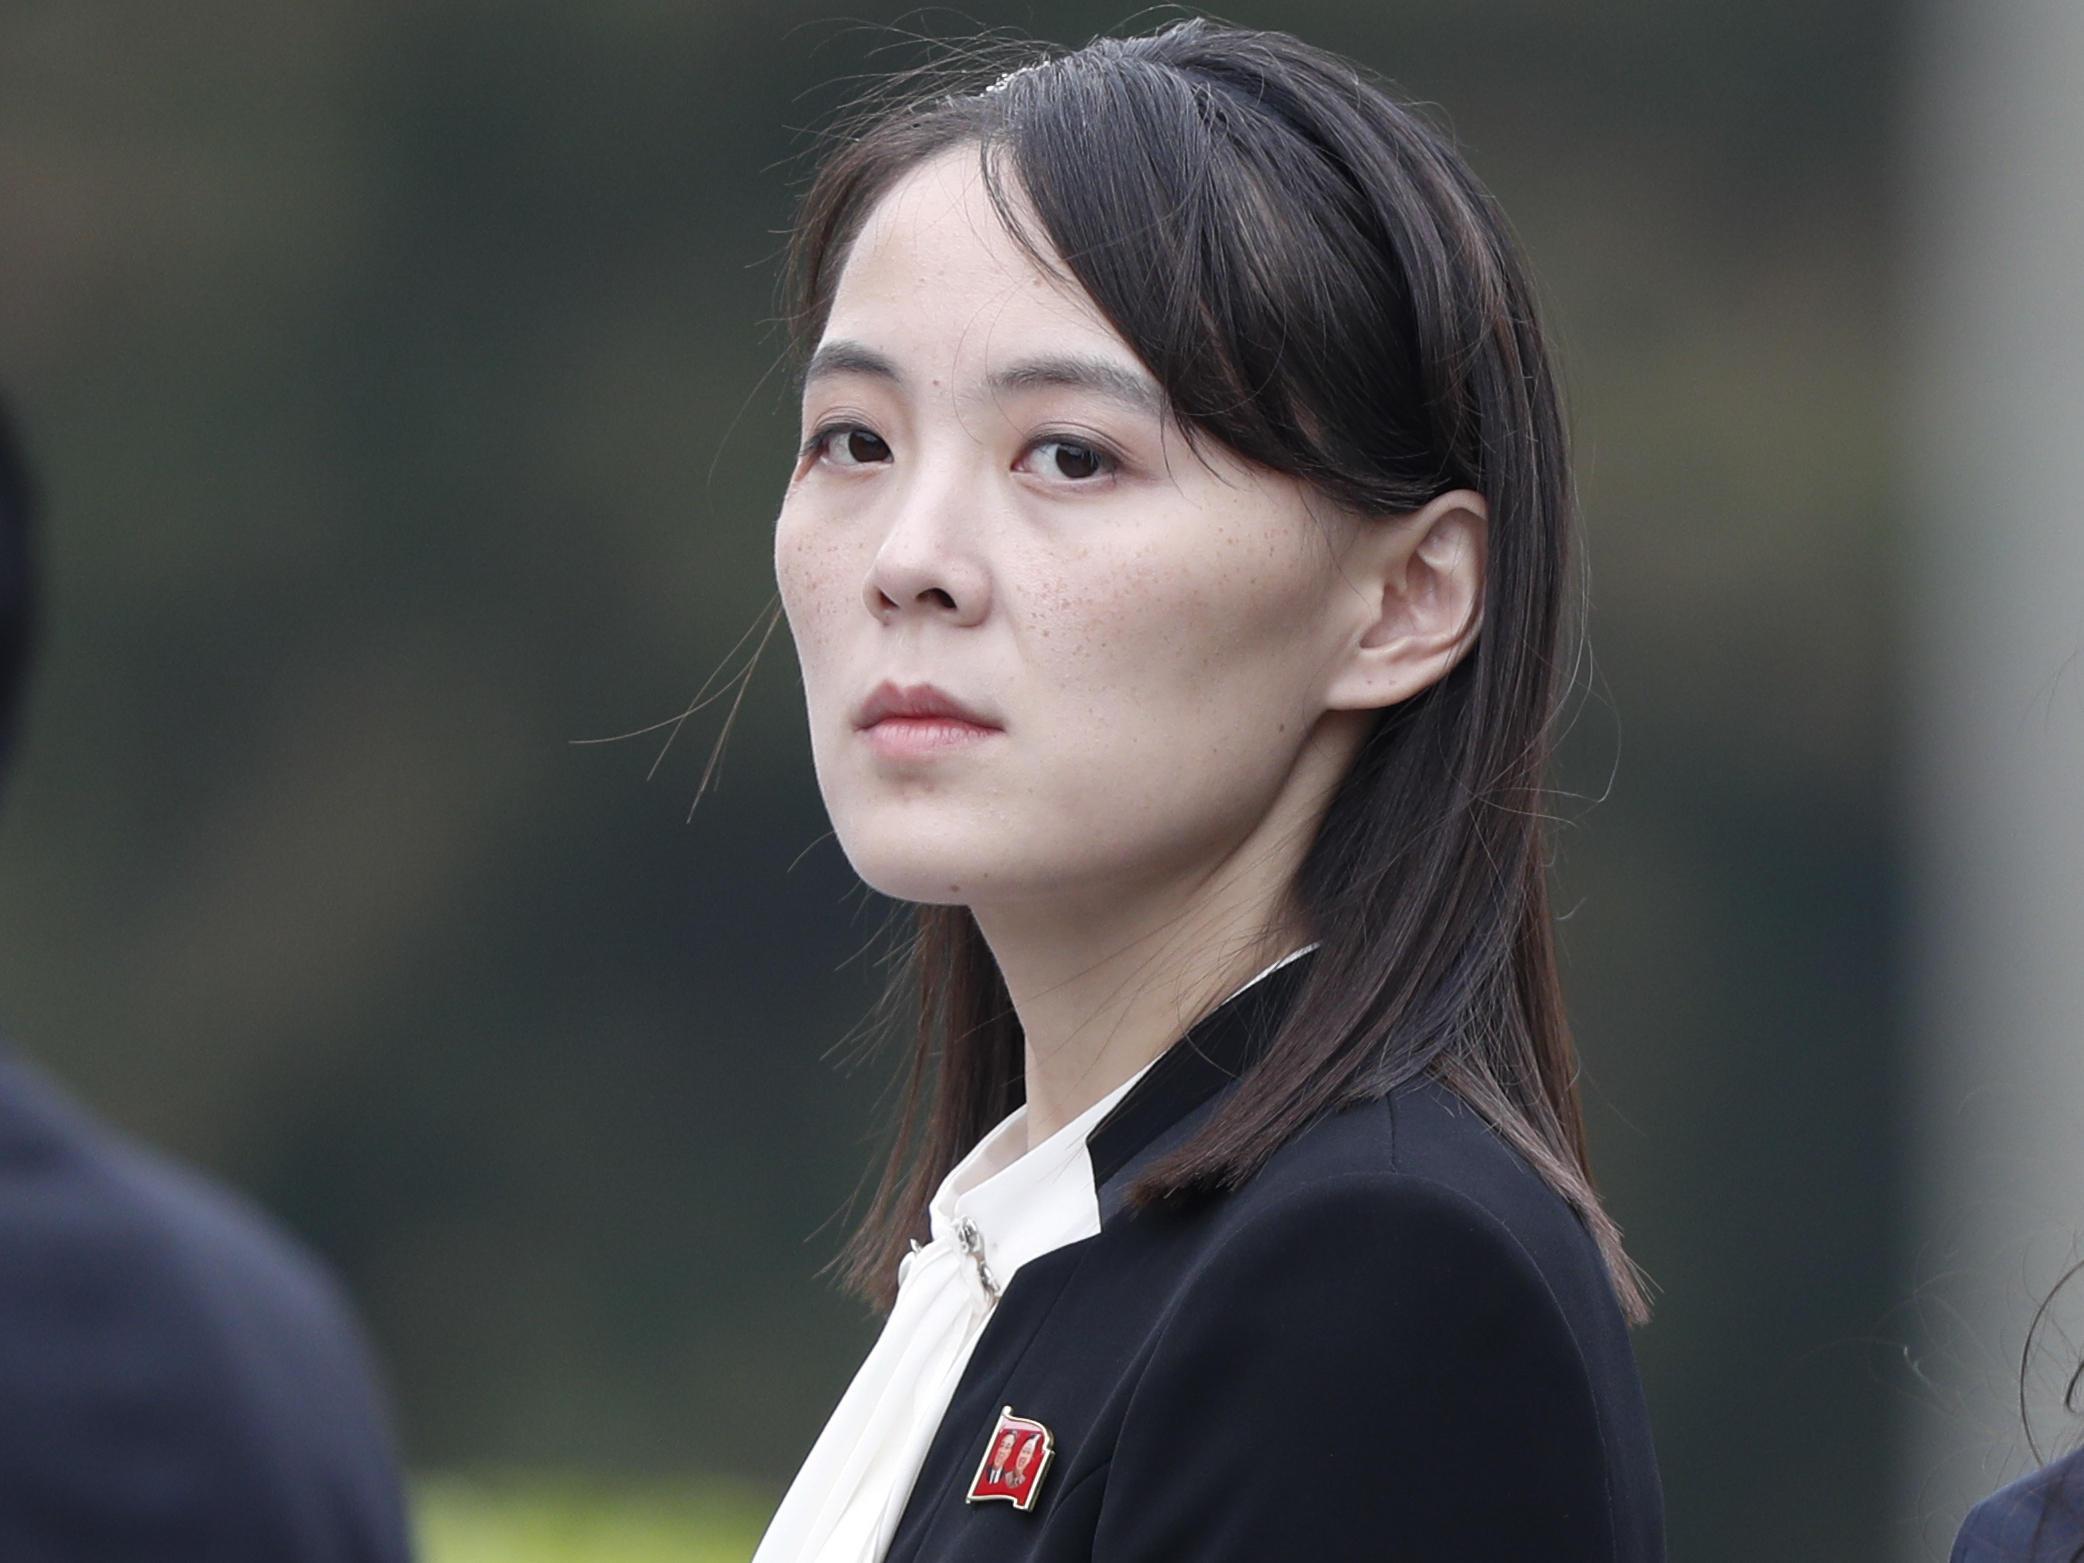 Kim Yo-Jong terá mais responsabilidades devido à saúde debilitada de seu irmão. FOTO: https://www.wuwf.org/post/kim-yo-jong-sister-north-koreas-ruler-rises-through-ranks-tough-rhetoric